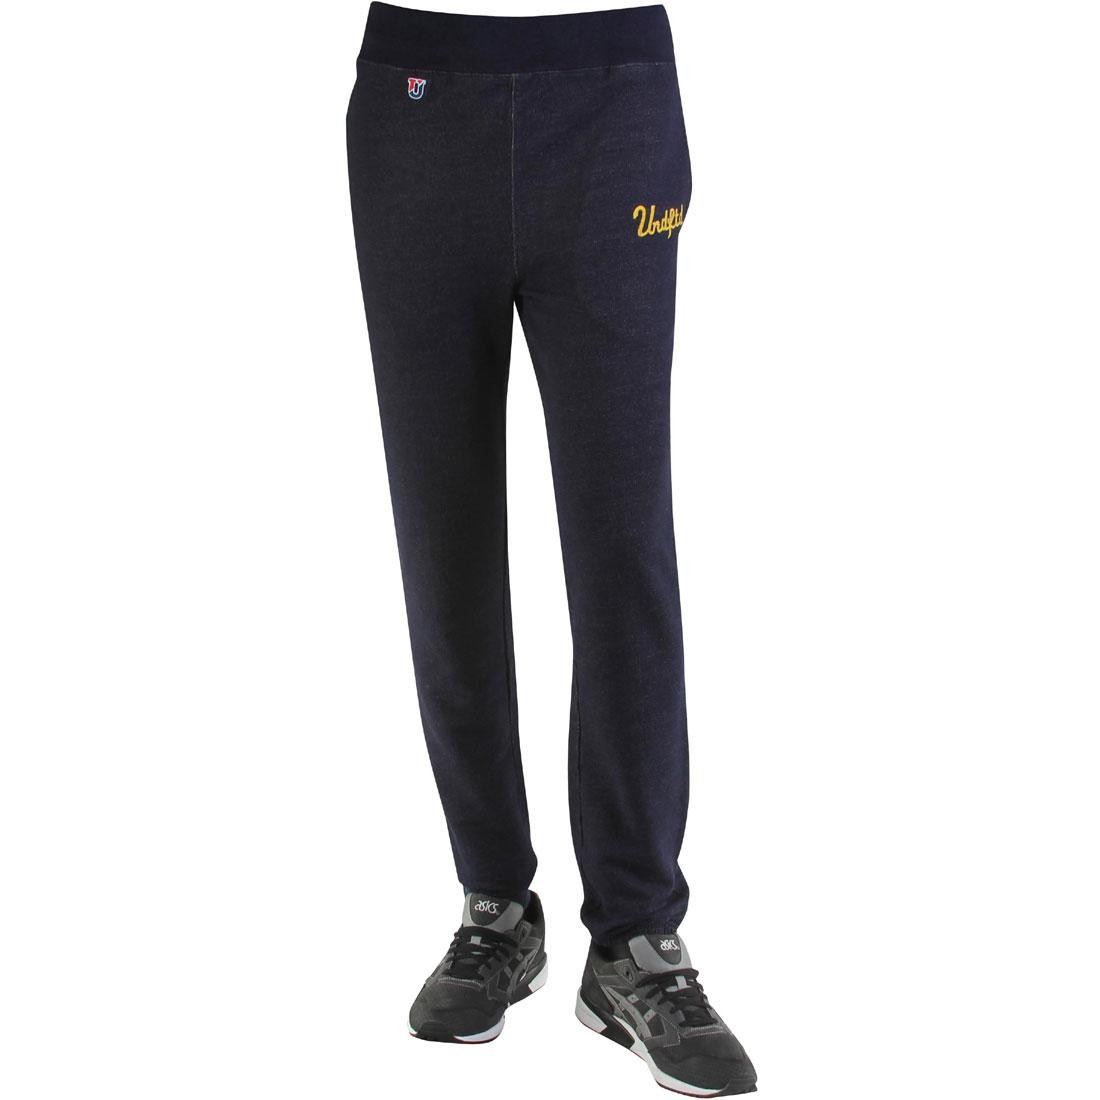 Undefeated Chain Sweatpants (navy / indigo)